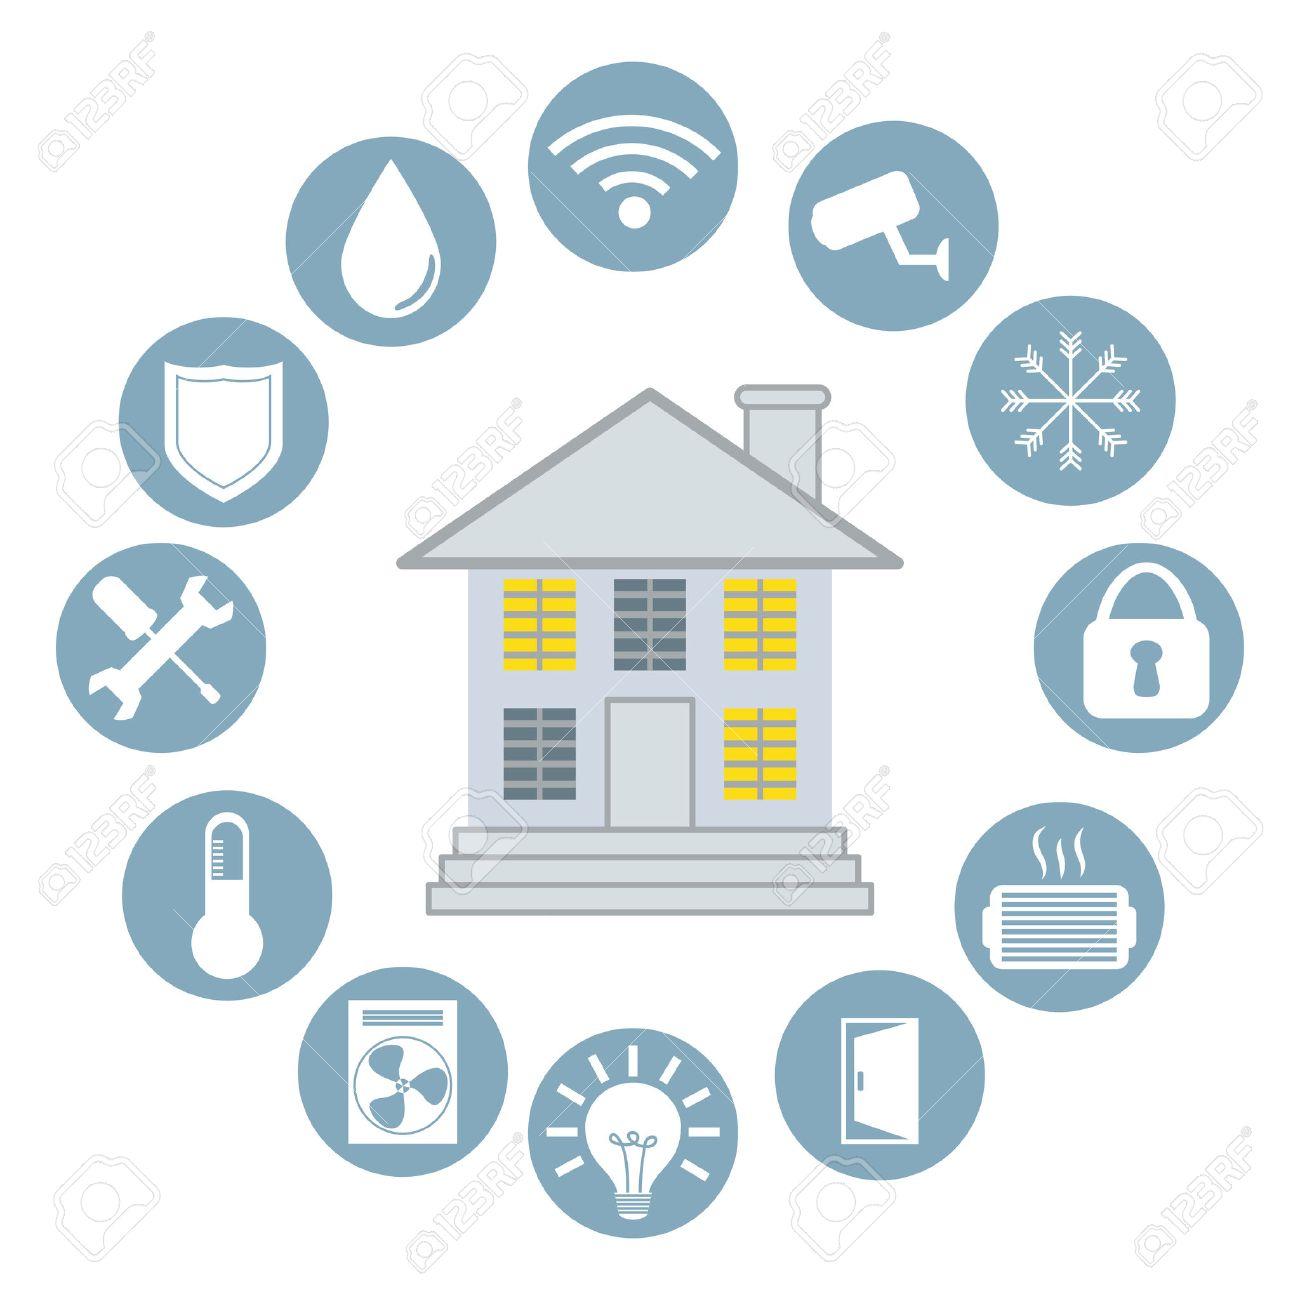 Smart Home Design, Vector Illustration Eps10 Graphic Royalty Free ...